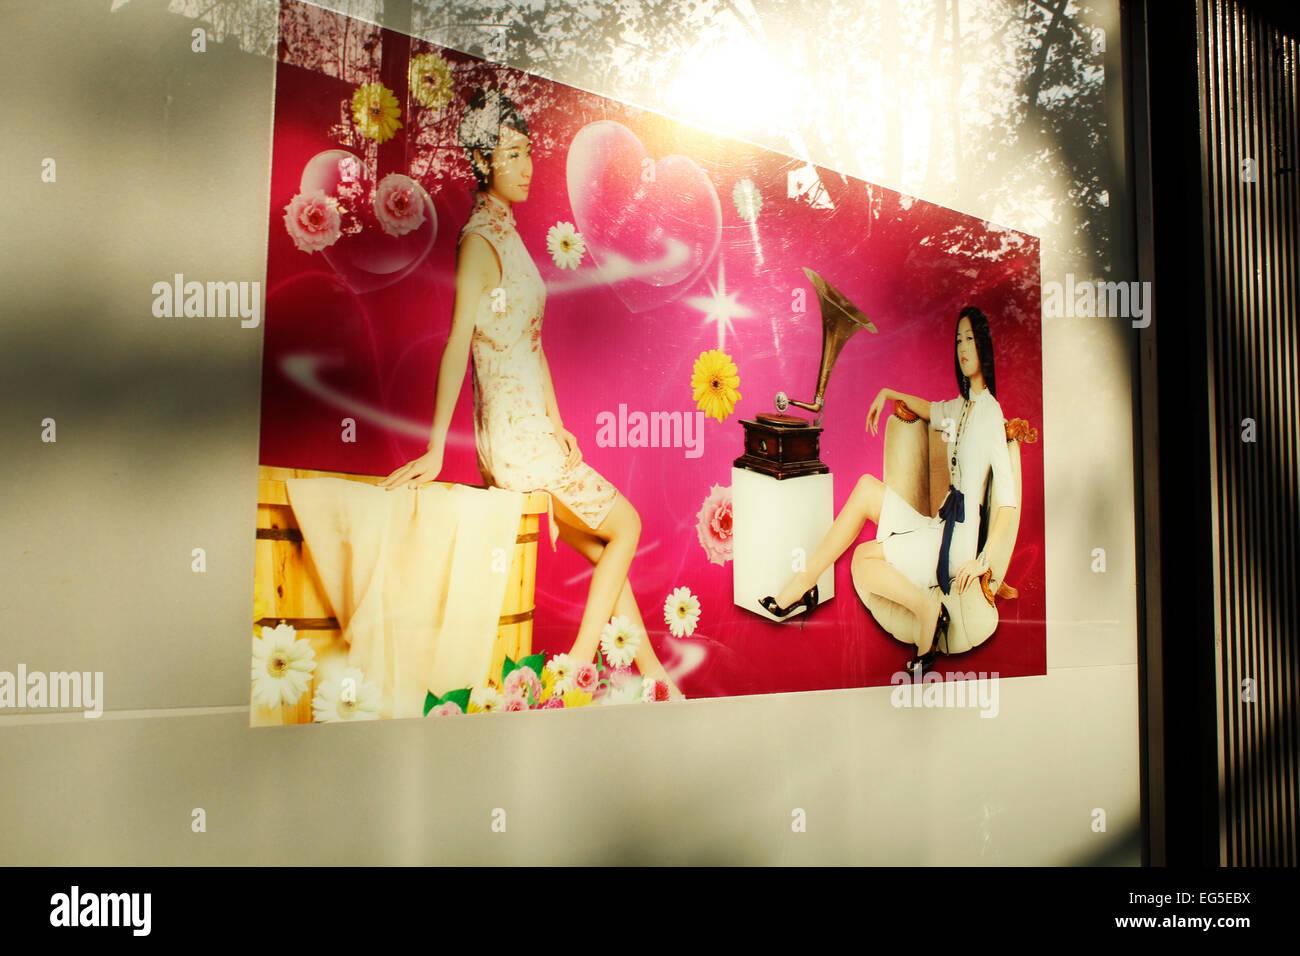 Chinese center massages shop window - Stock Image